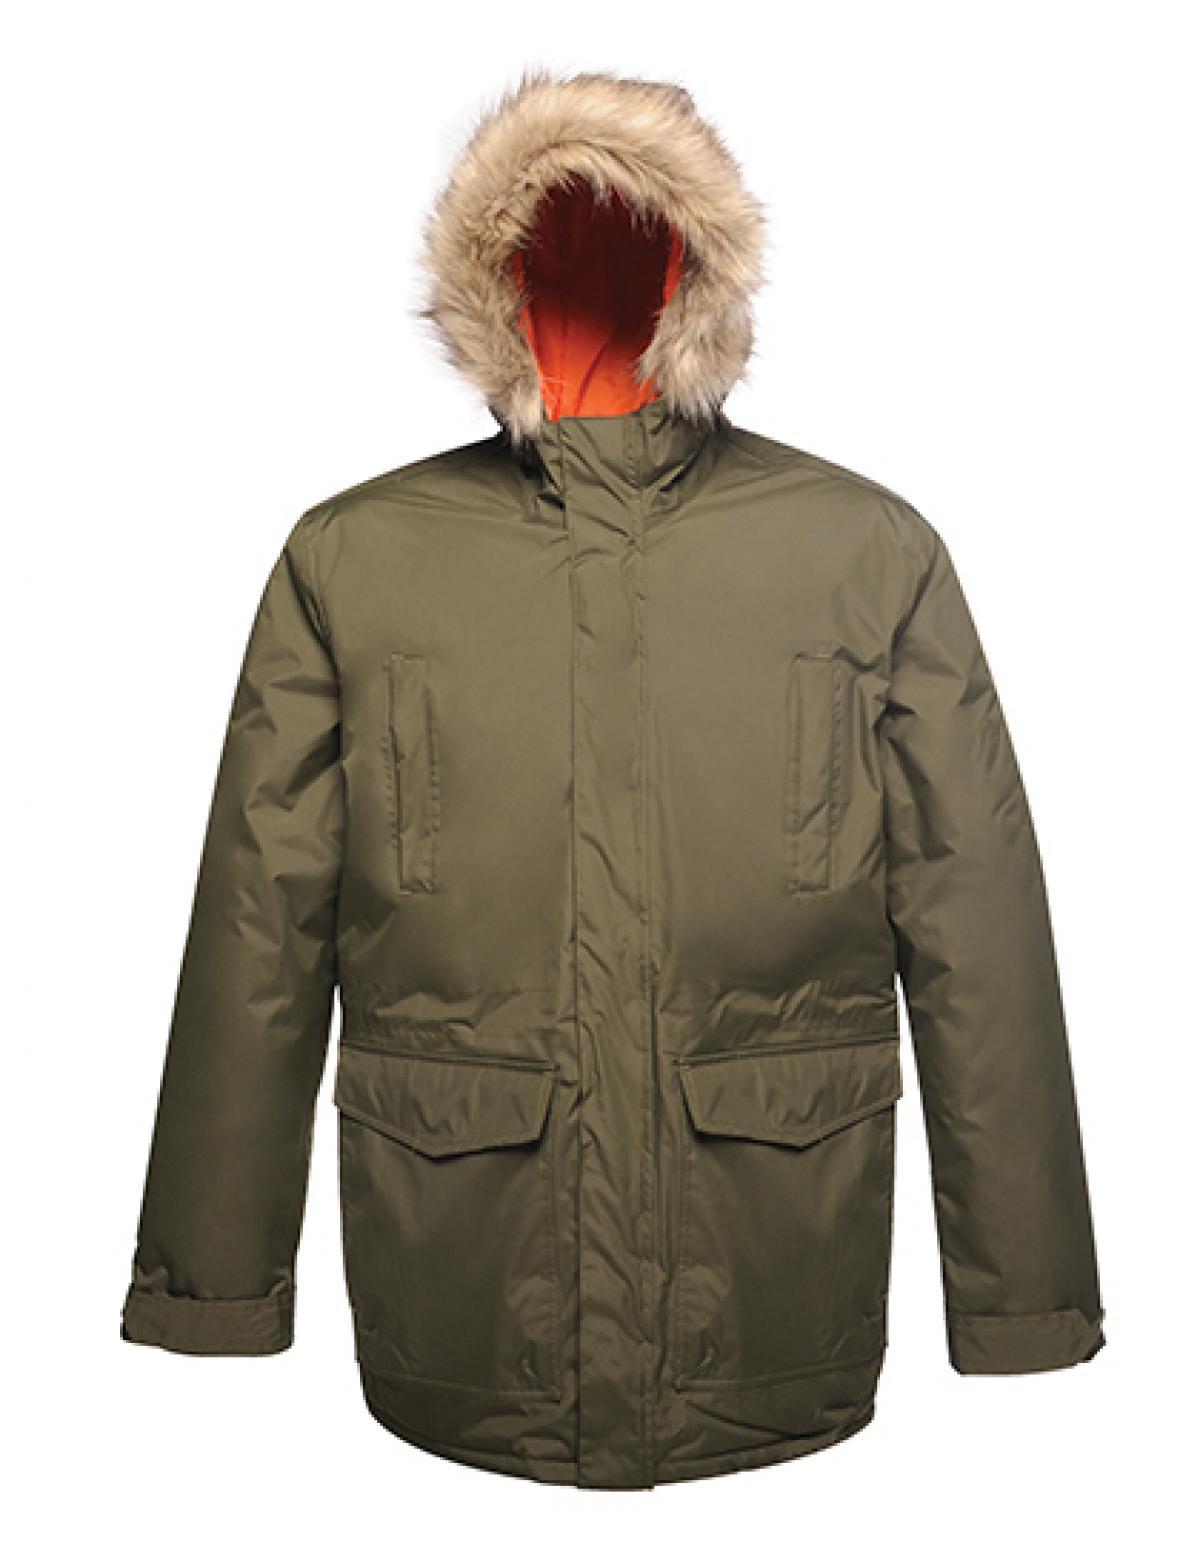 new product 8ee61 45769 Herren Classic Parka Jacket | TRA300 | Regatta